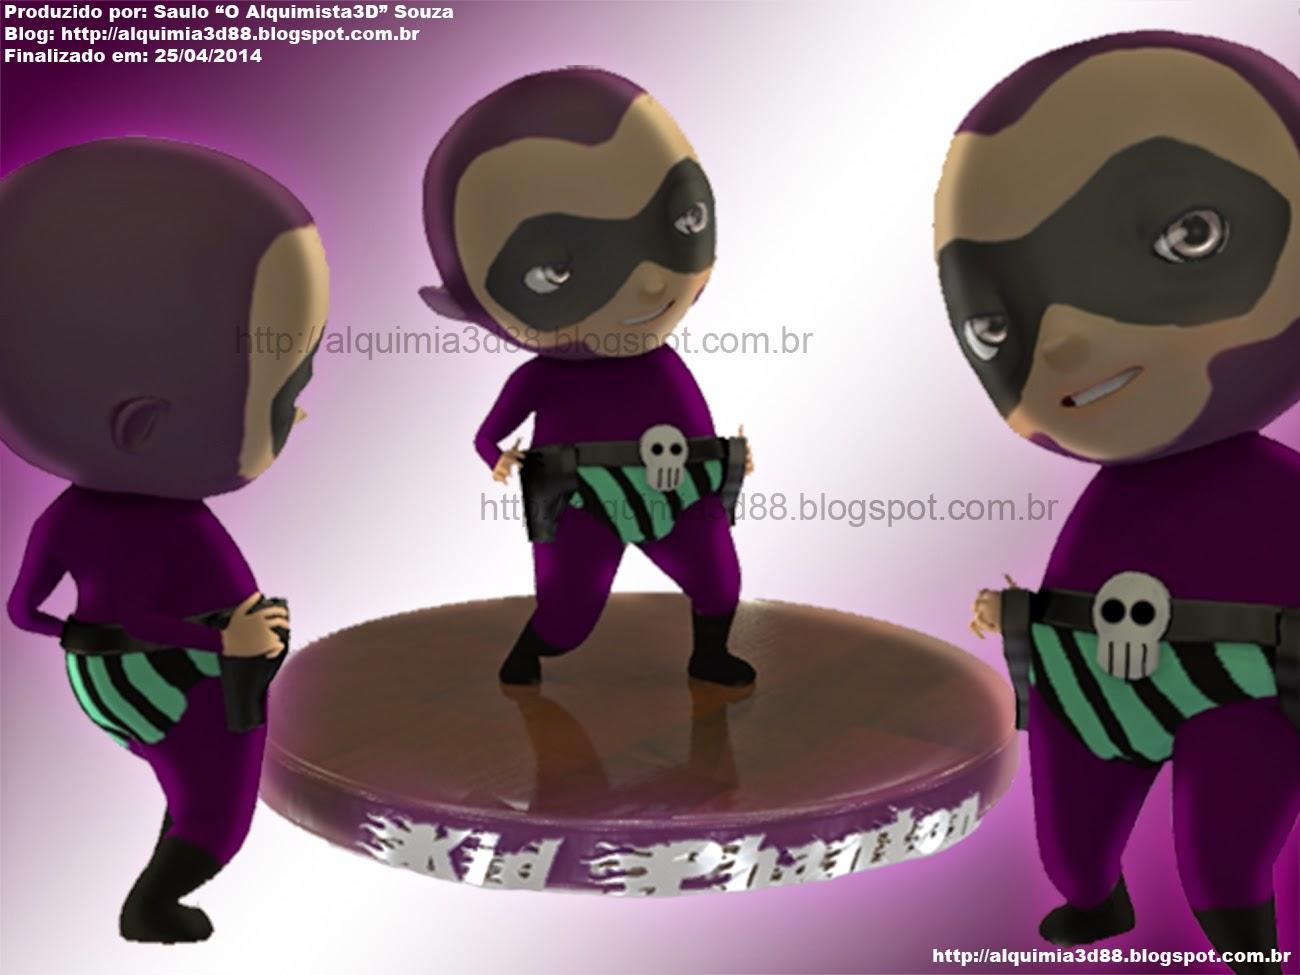 The Phantom by Saulo Alquimista 3D